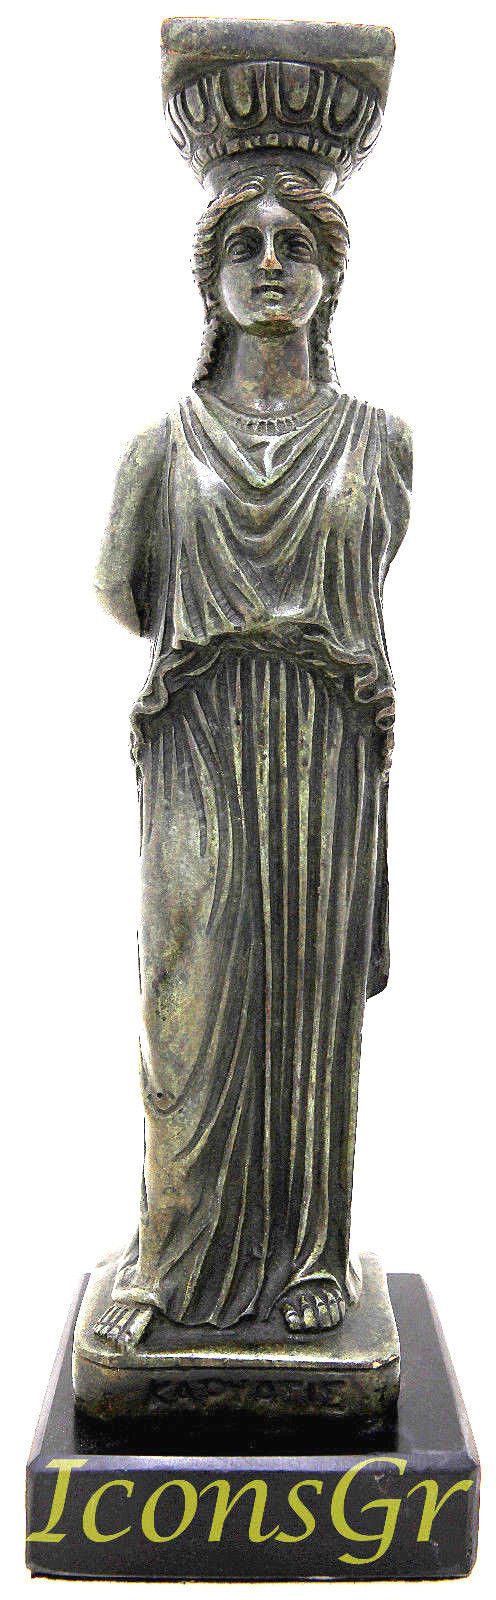 Ancient Greek Bronze Museum Statue Replica of Kariatis (1138)